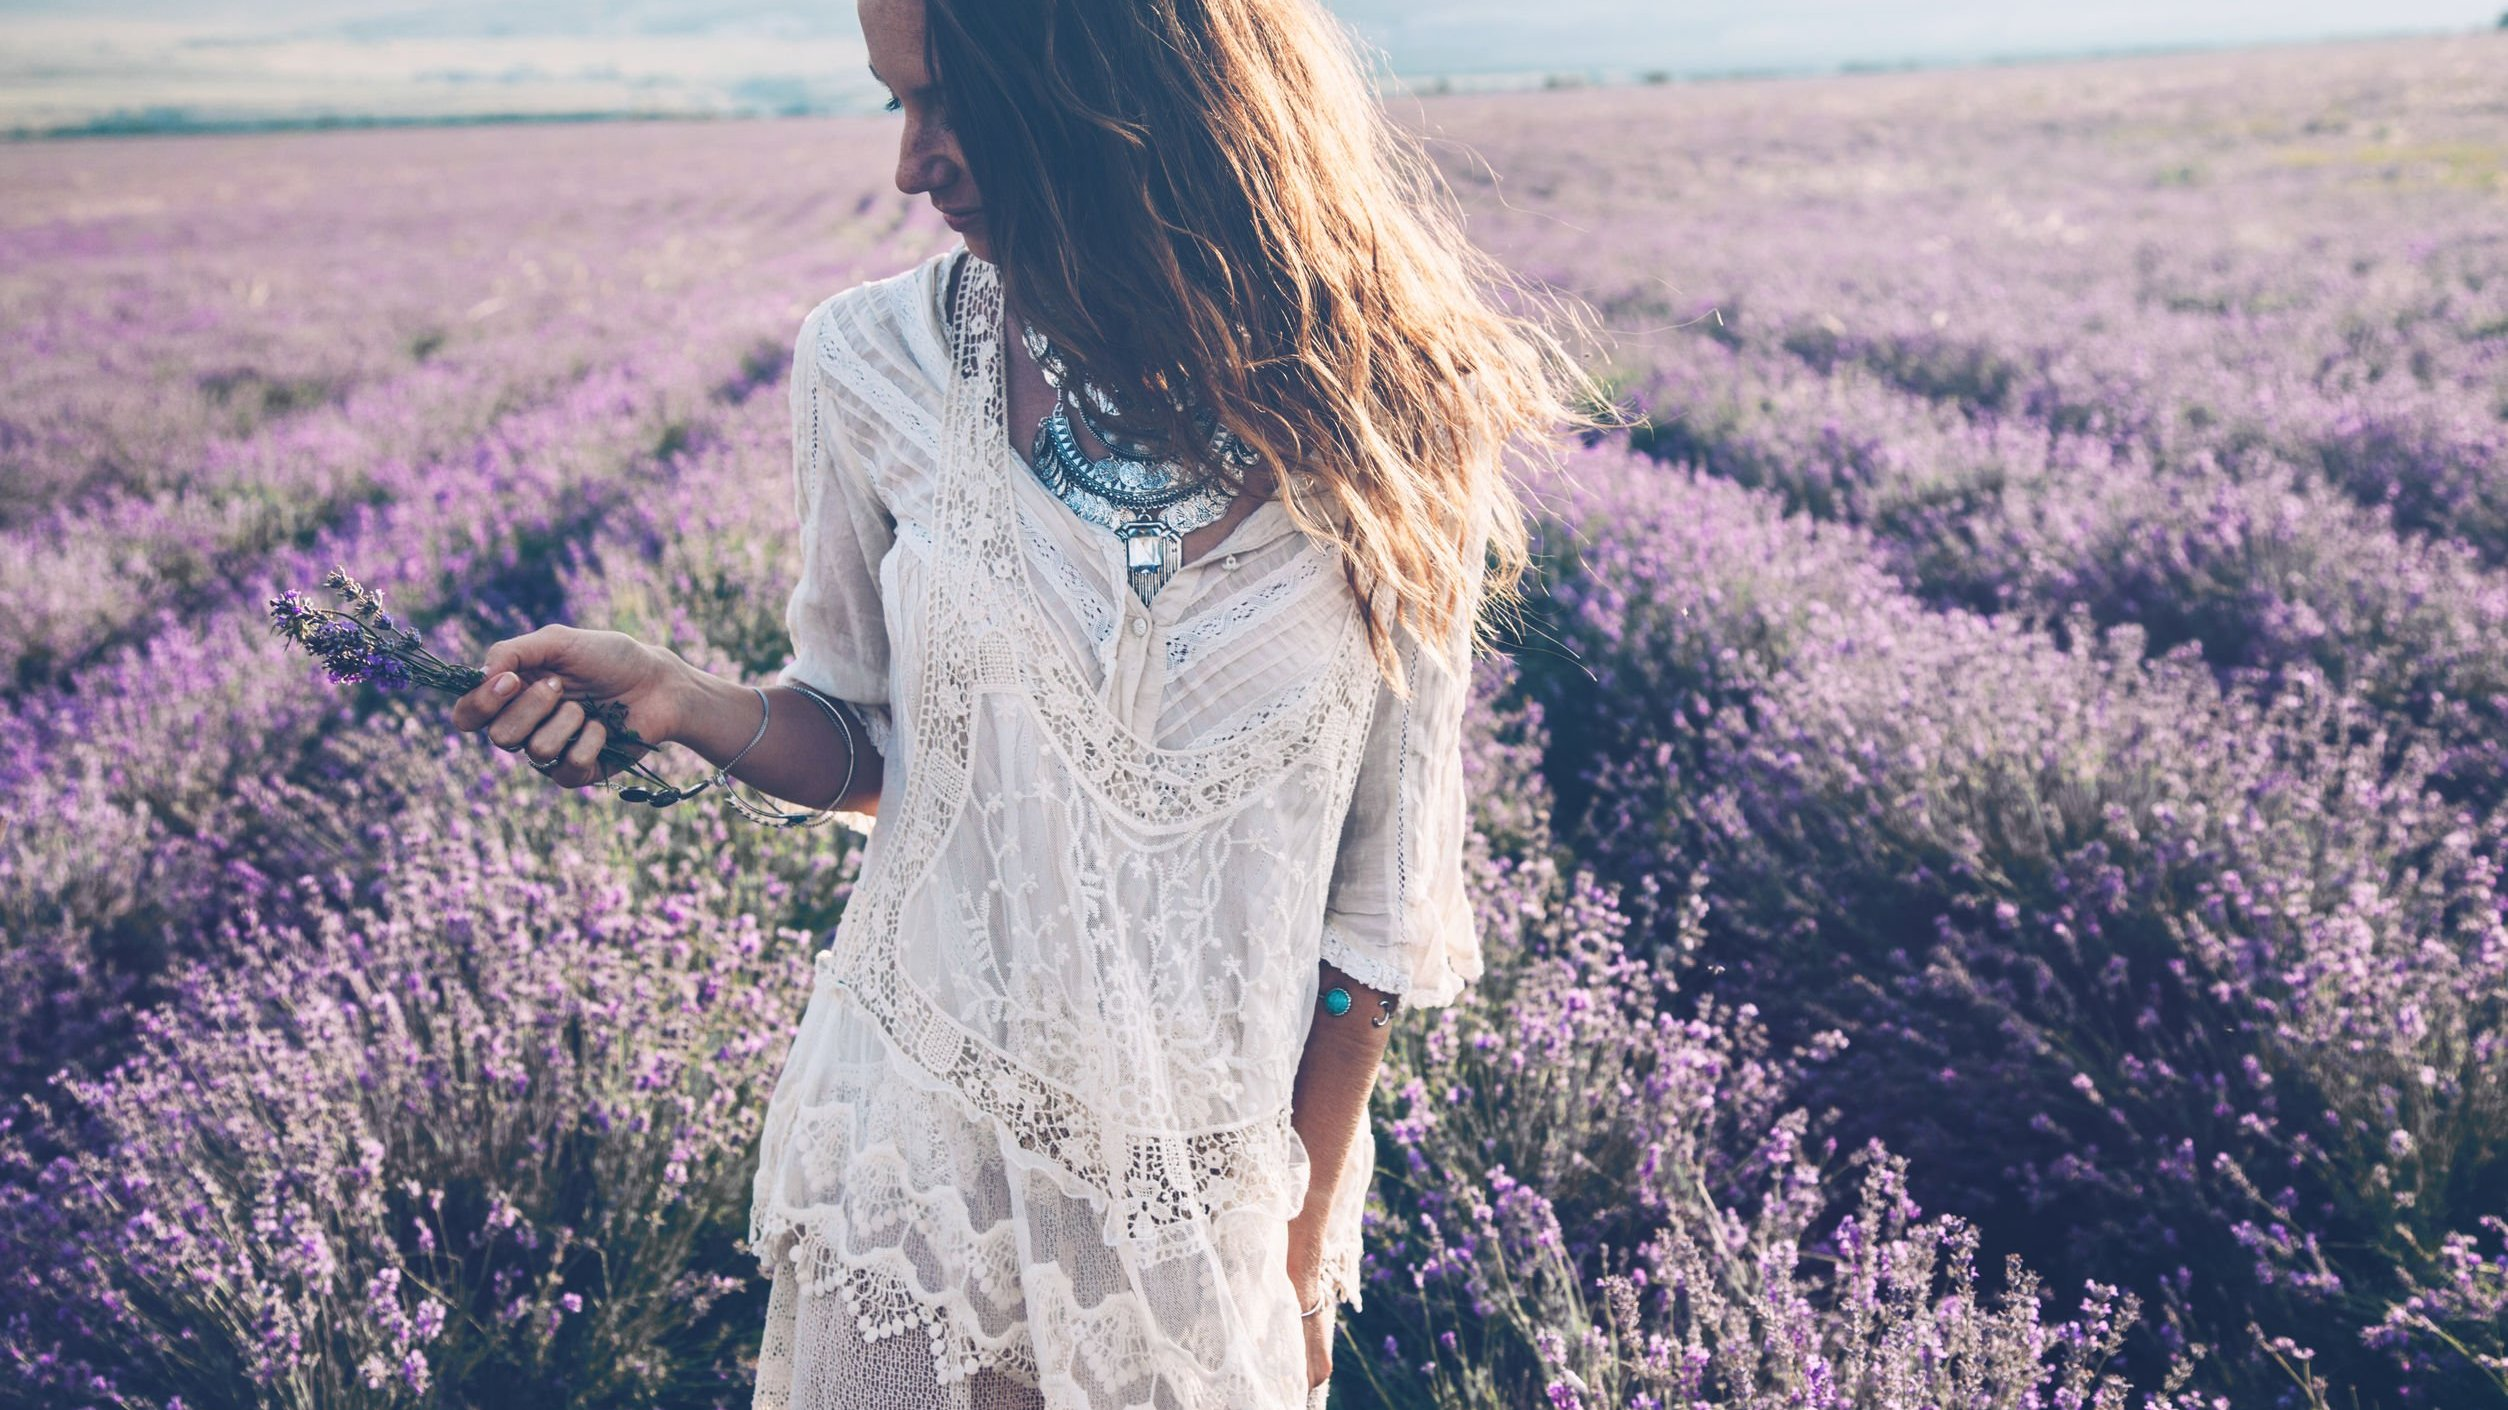 Mulher branca e loira, vestindo vestido branco, num campo de lavanda.